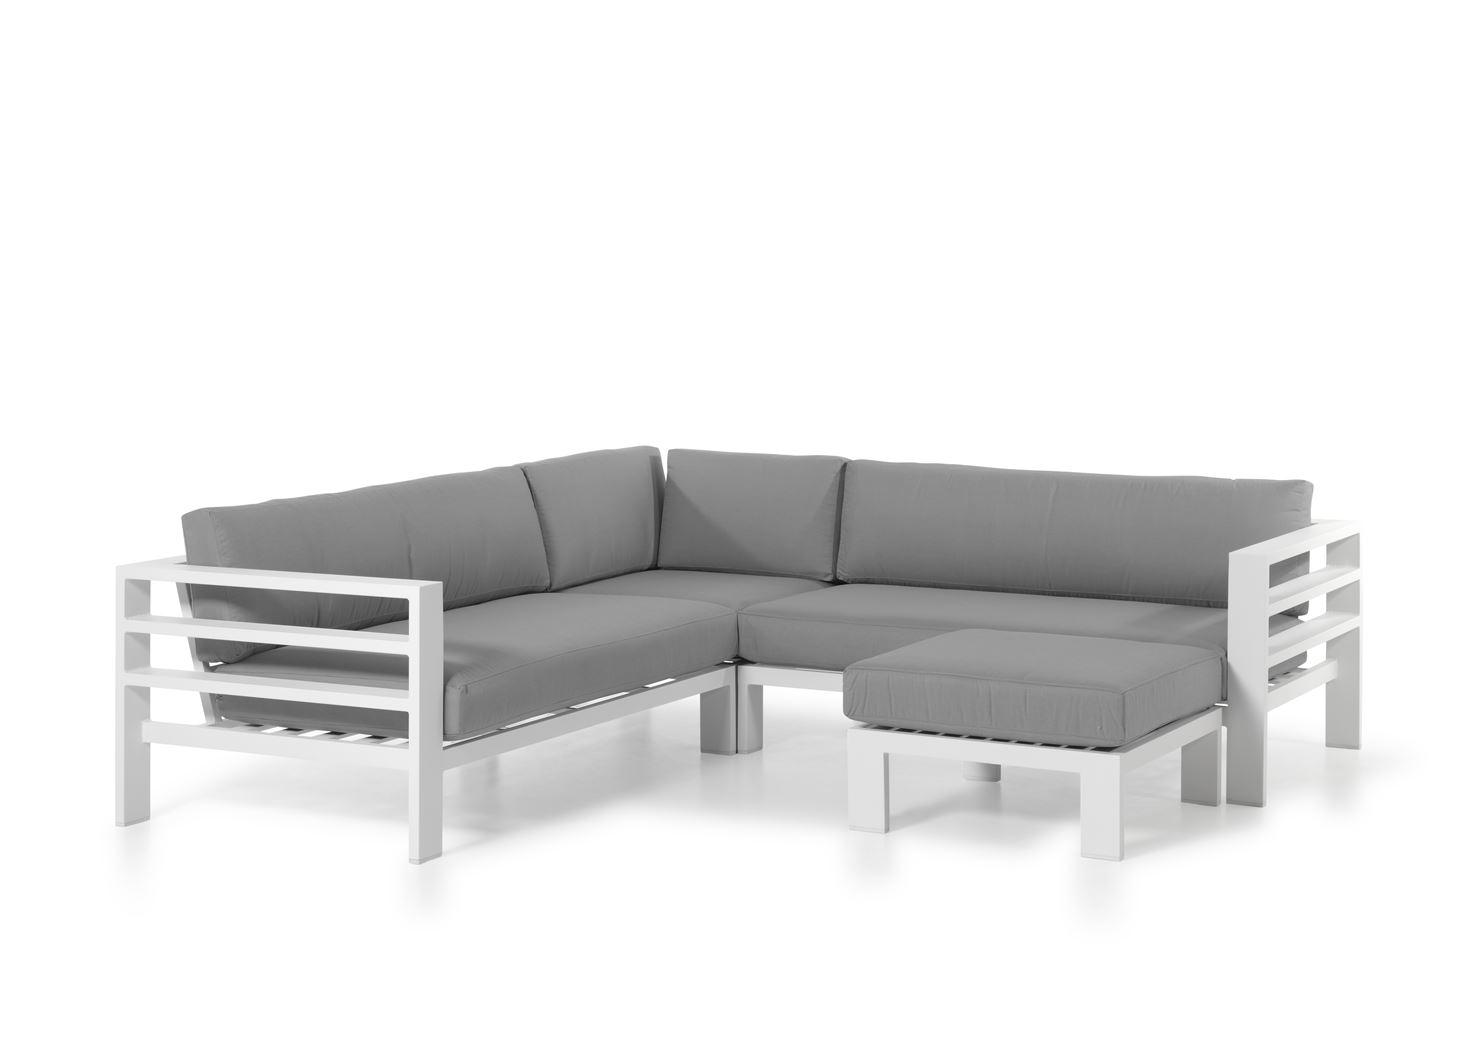 gescova cadiz modular set alu white cushions grey